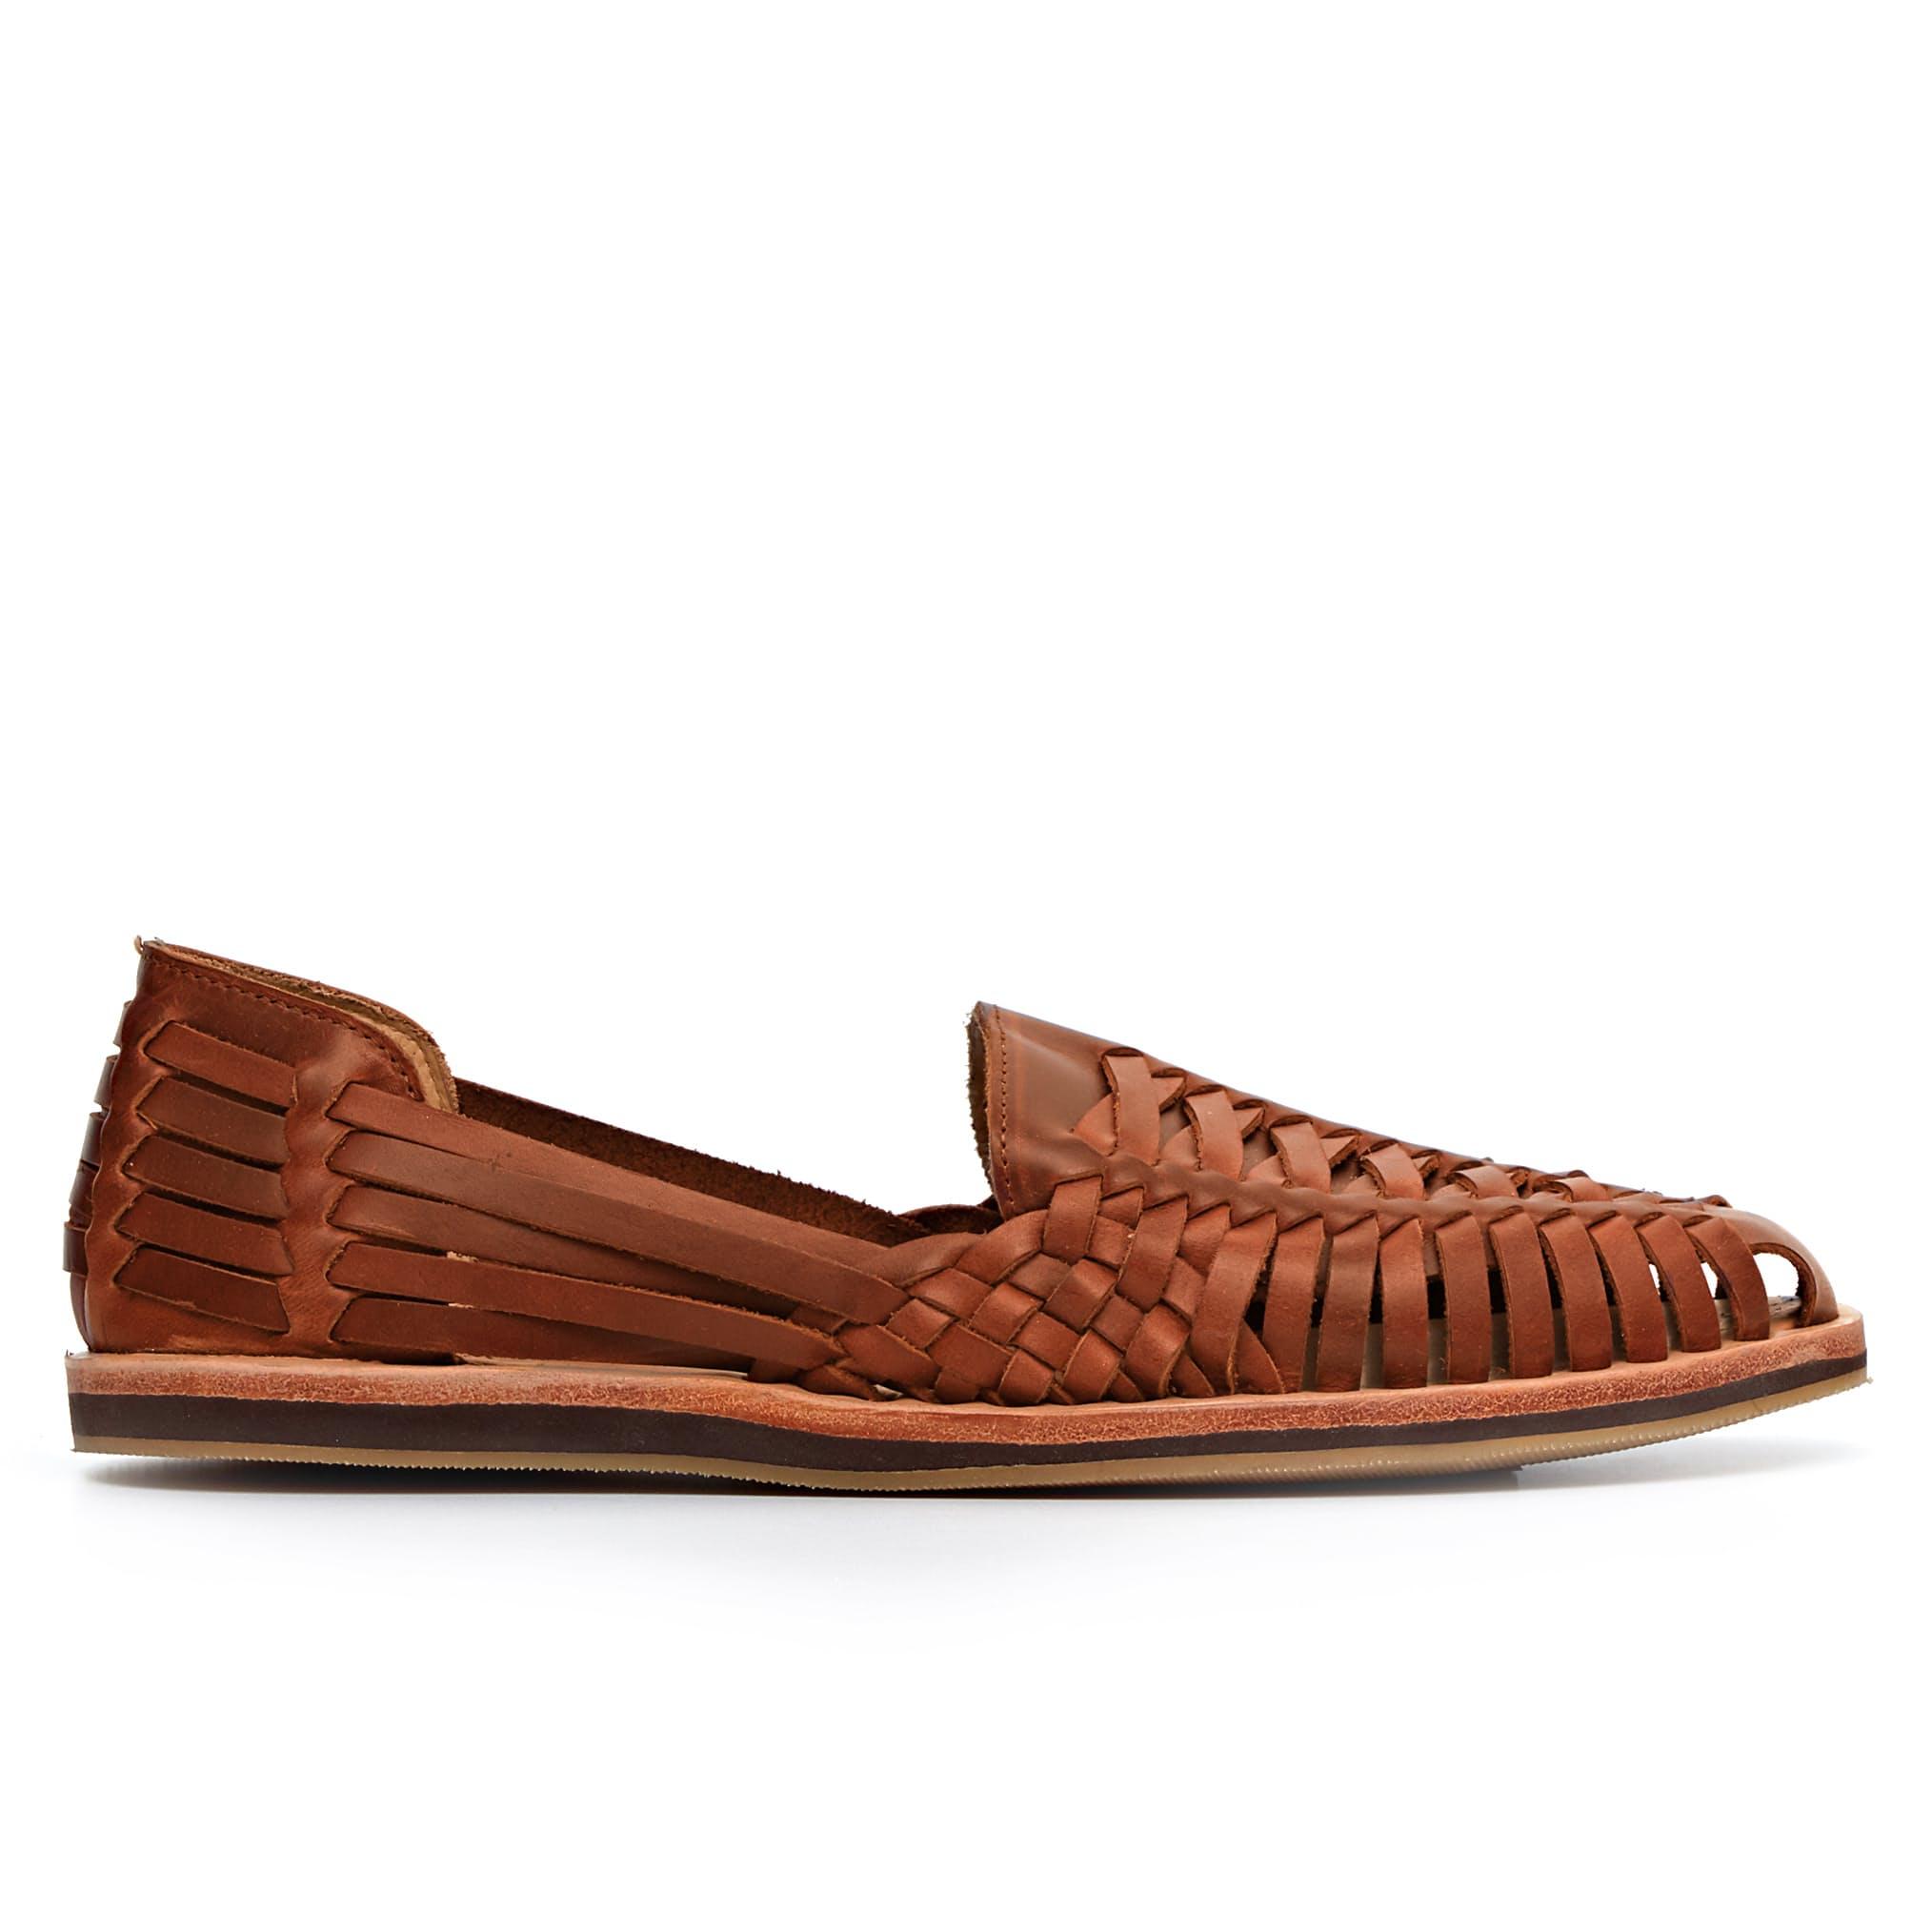 8jr4tahg6h nisolo huarache sandal 0 original.jpg?ixlib=rails 2.1